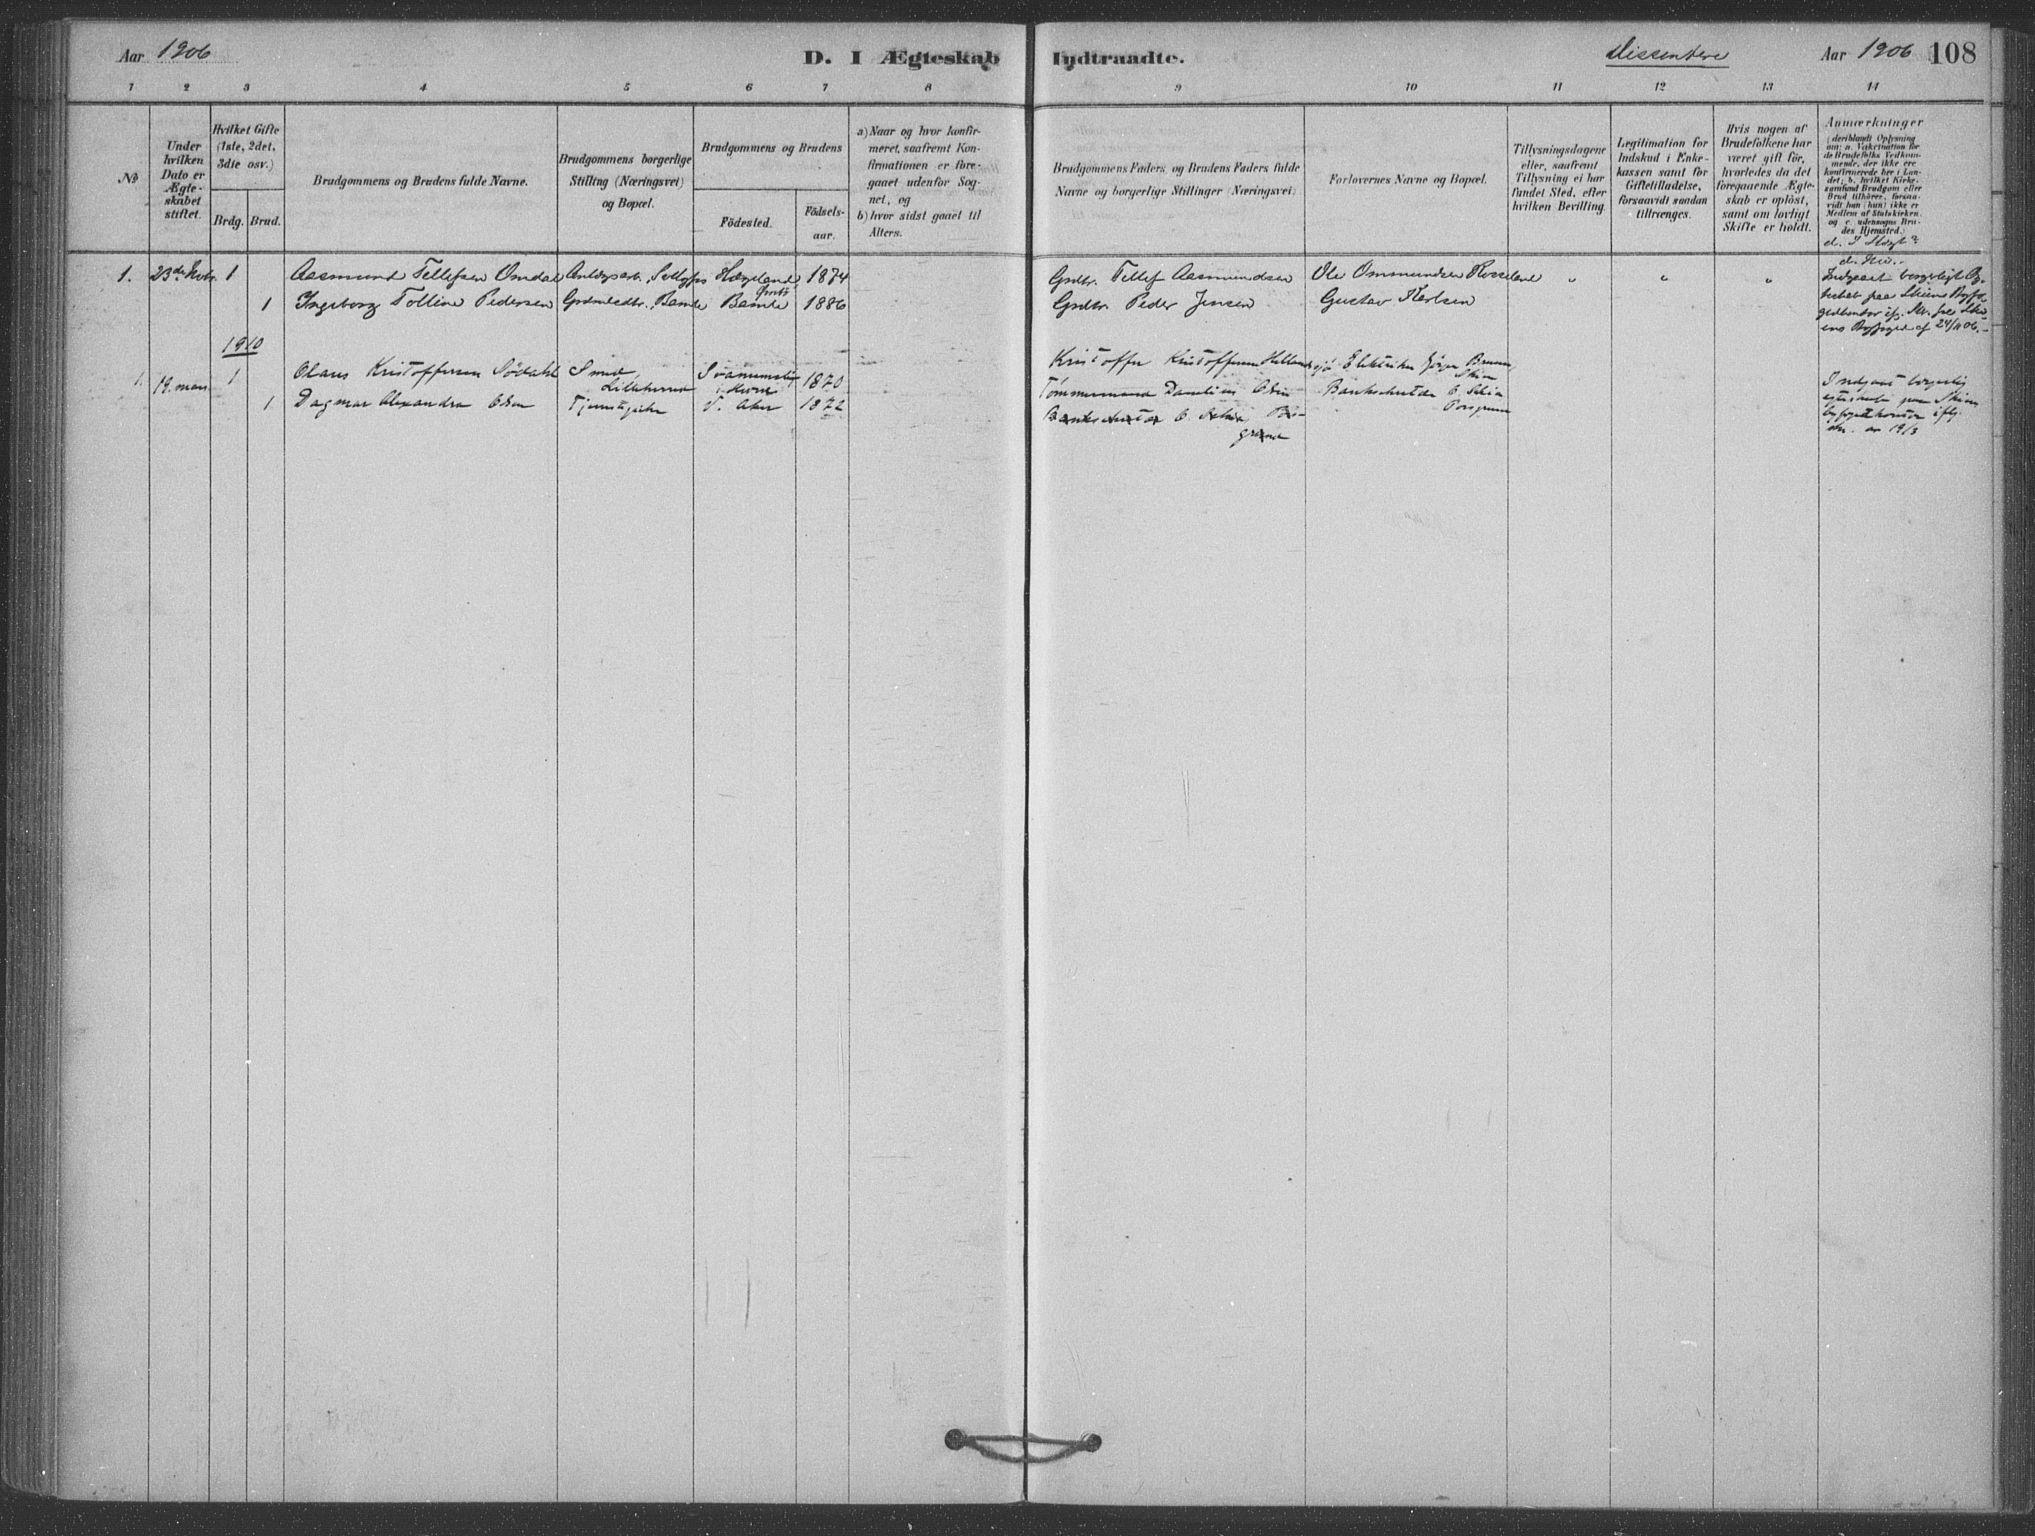 SAKO, Heddal kirkebøker, F/Fb/L0002: Ministerialbok nr. II 2, 1878-1913, s. 108